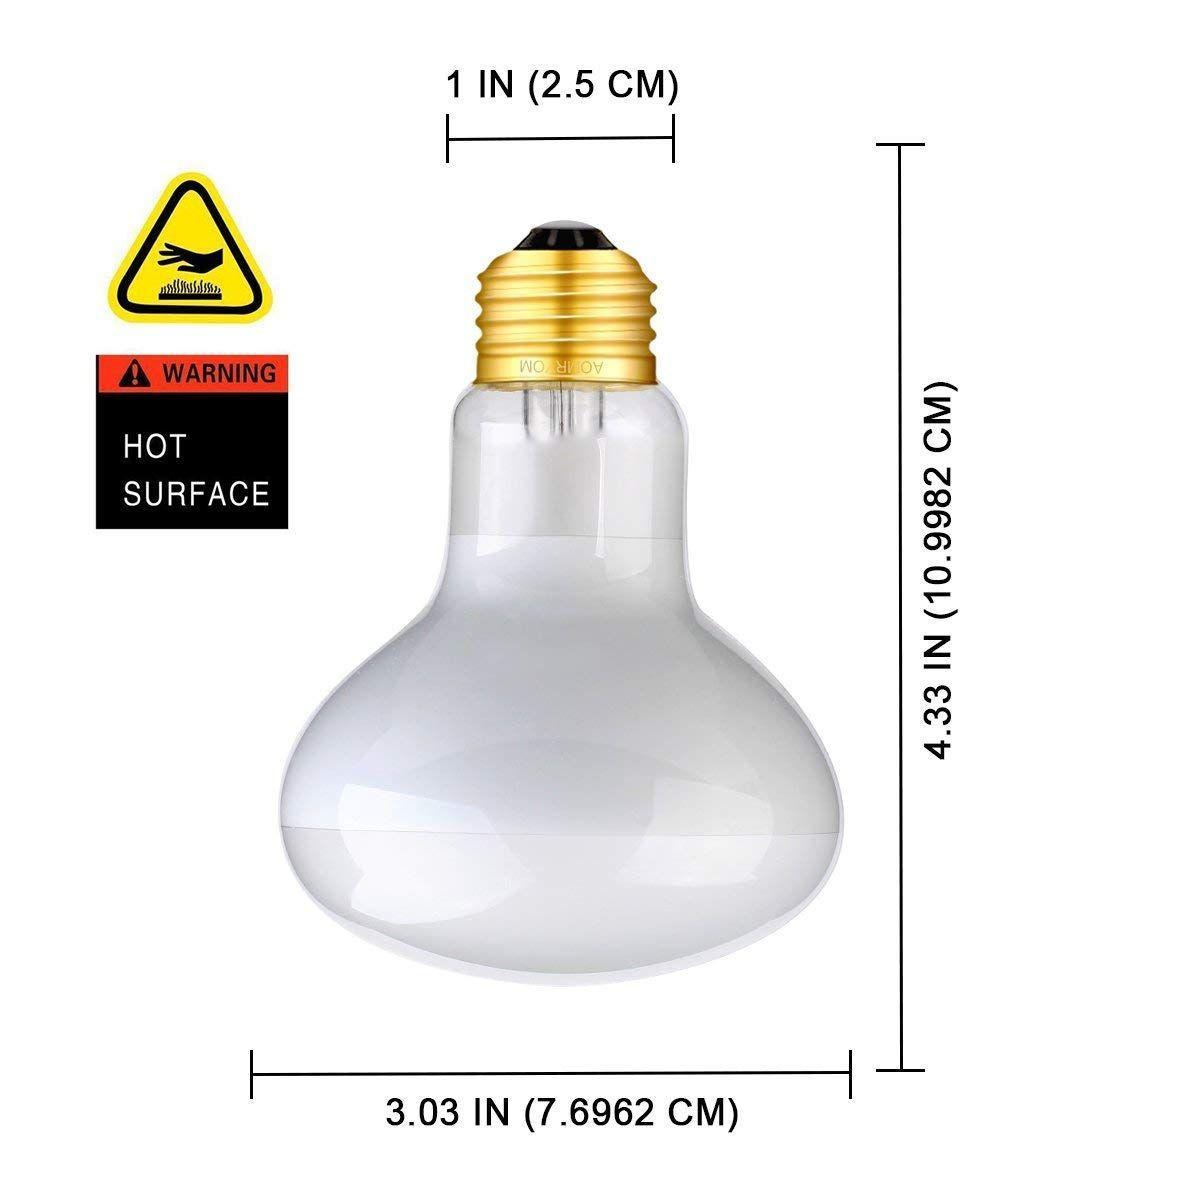 Aomryom 2 Pack 100w Uva Basking Spot Lamp Soft White Light Heat Bulb Reptiles Amphibians Use Ad Basking Affiliate Spot Lamp Uva